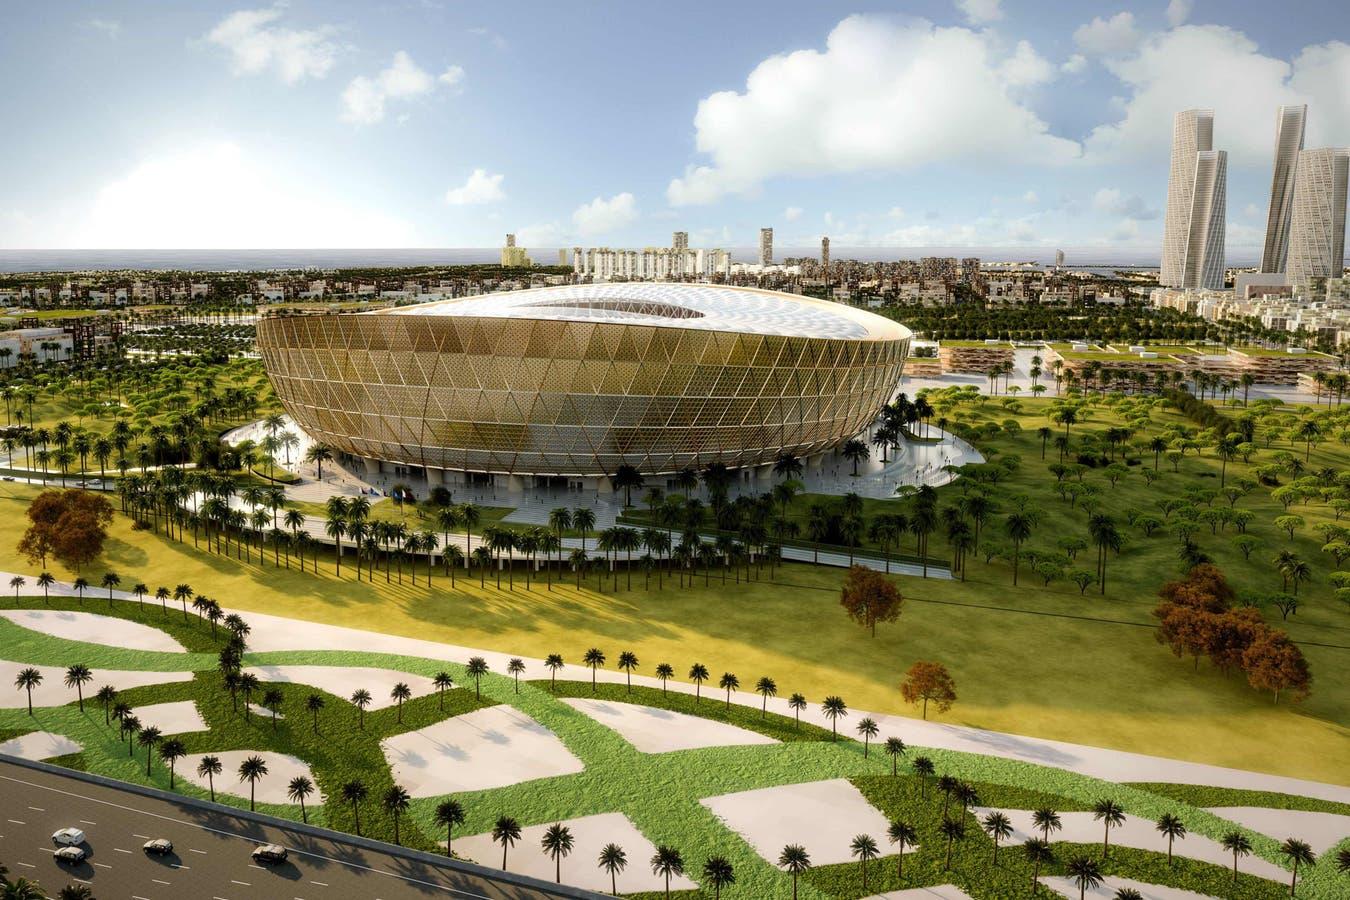 Qatar buscará albergar los JJOO en 2032